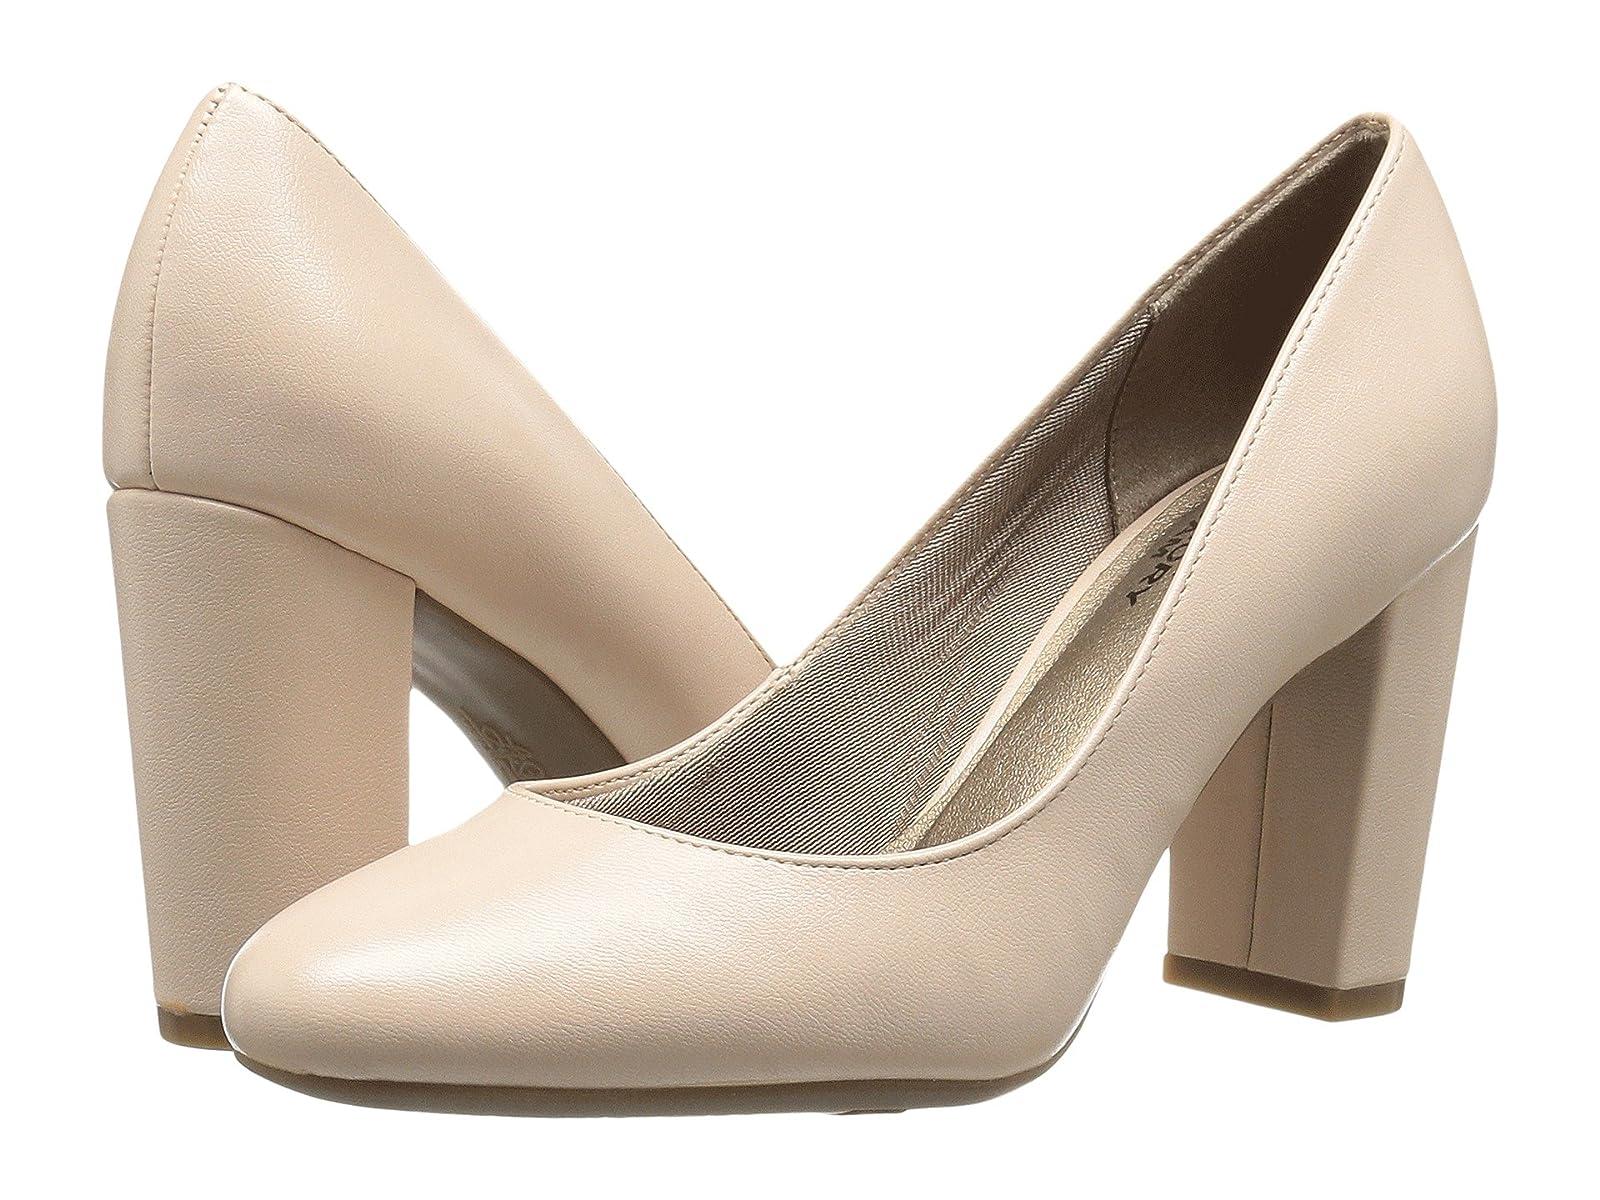 LifeStride FairingCheap and distinctive eye-catching shoes